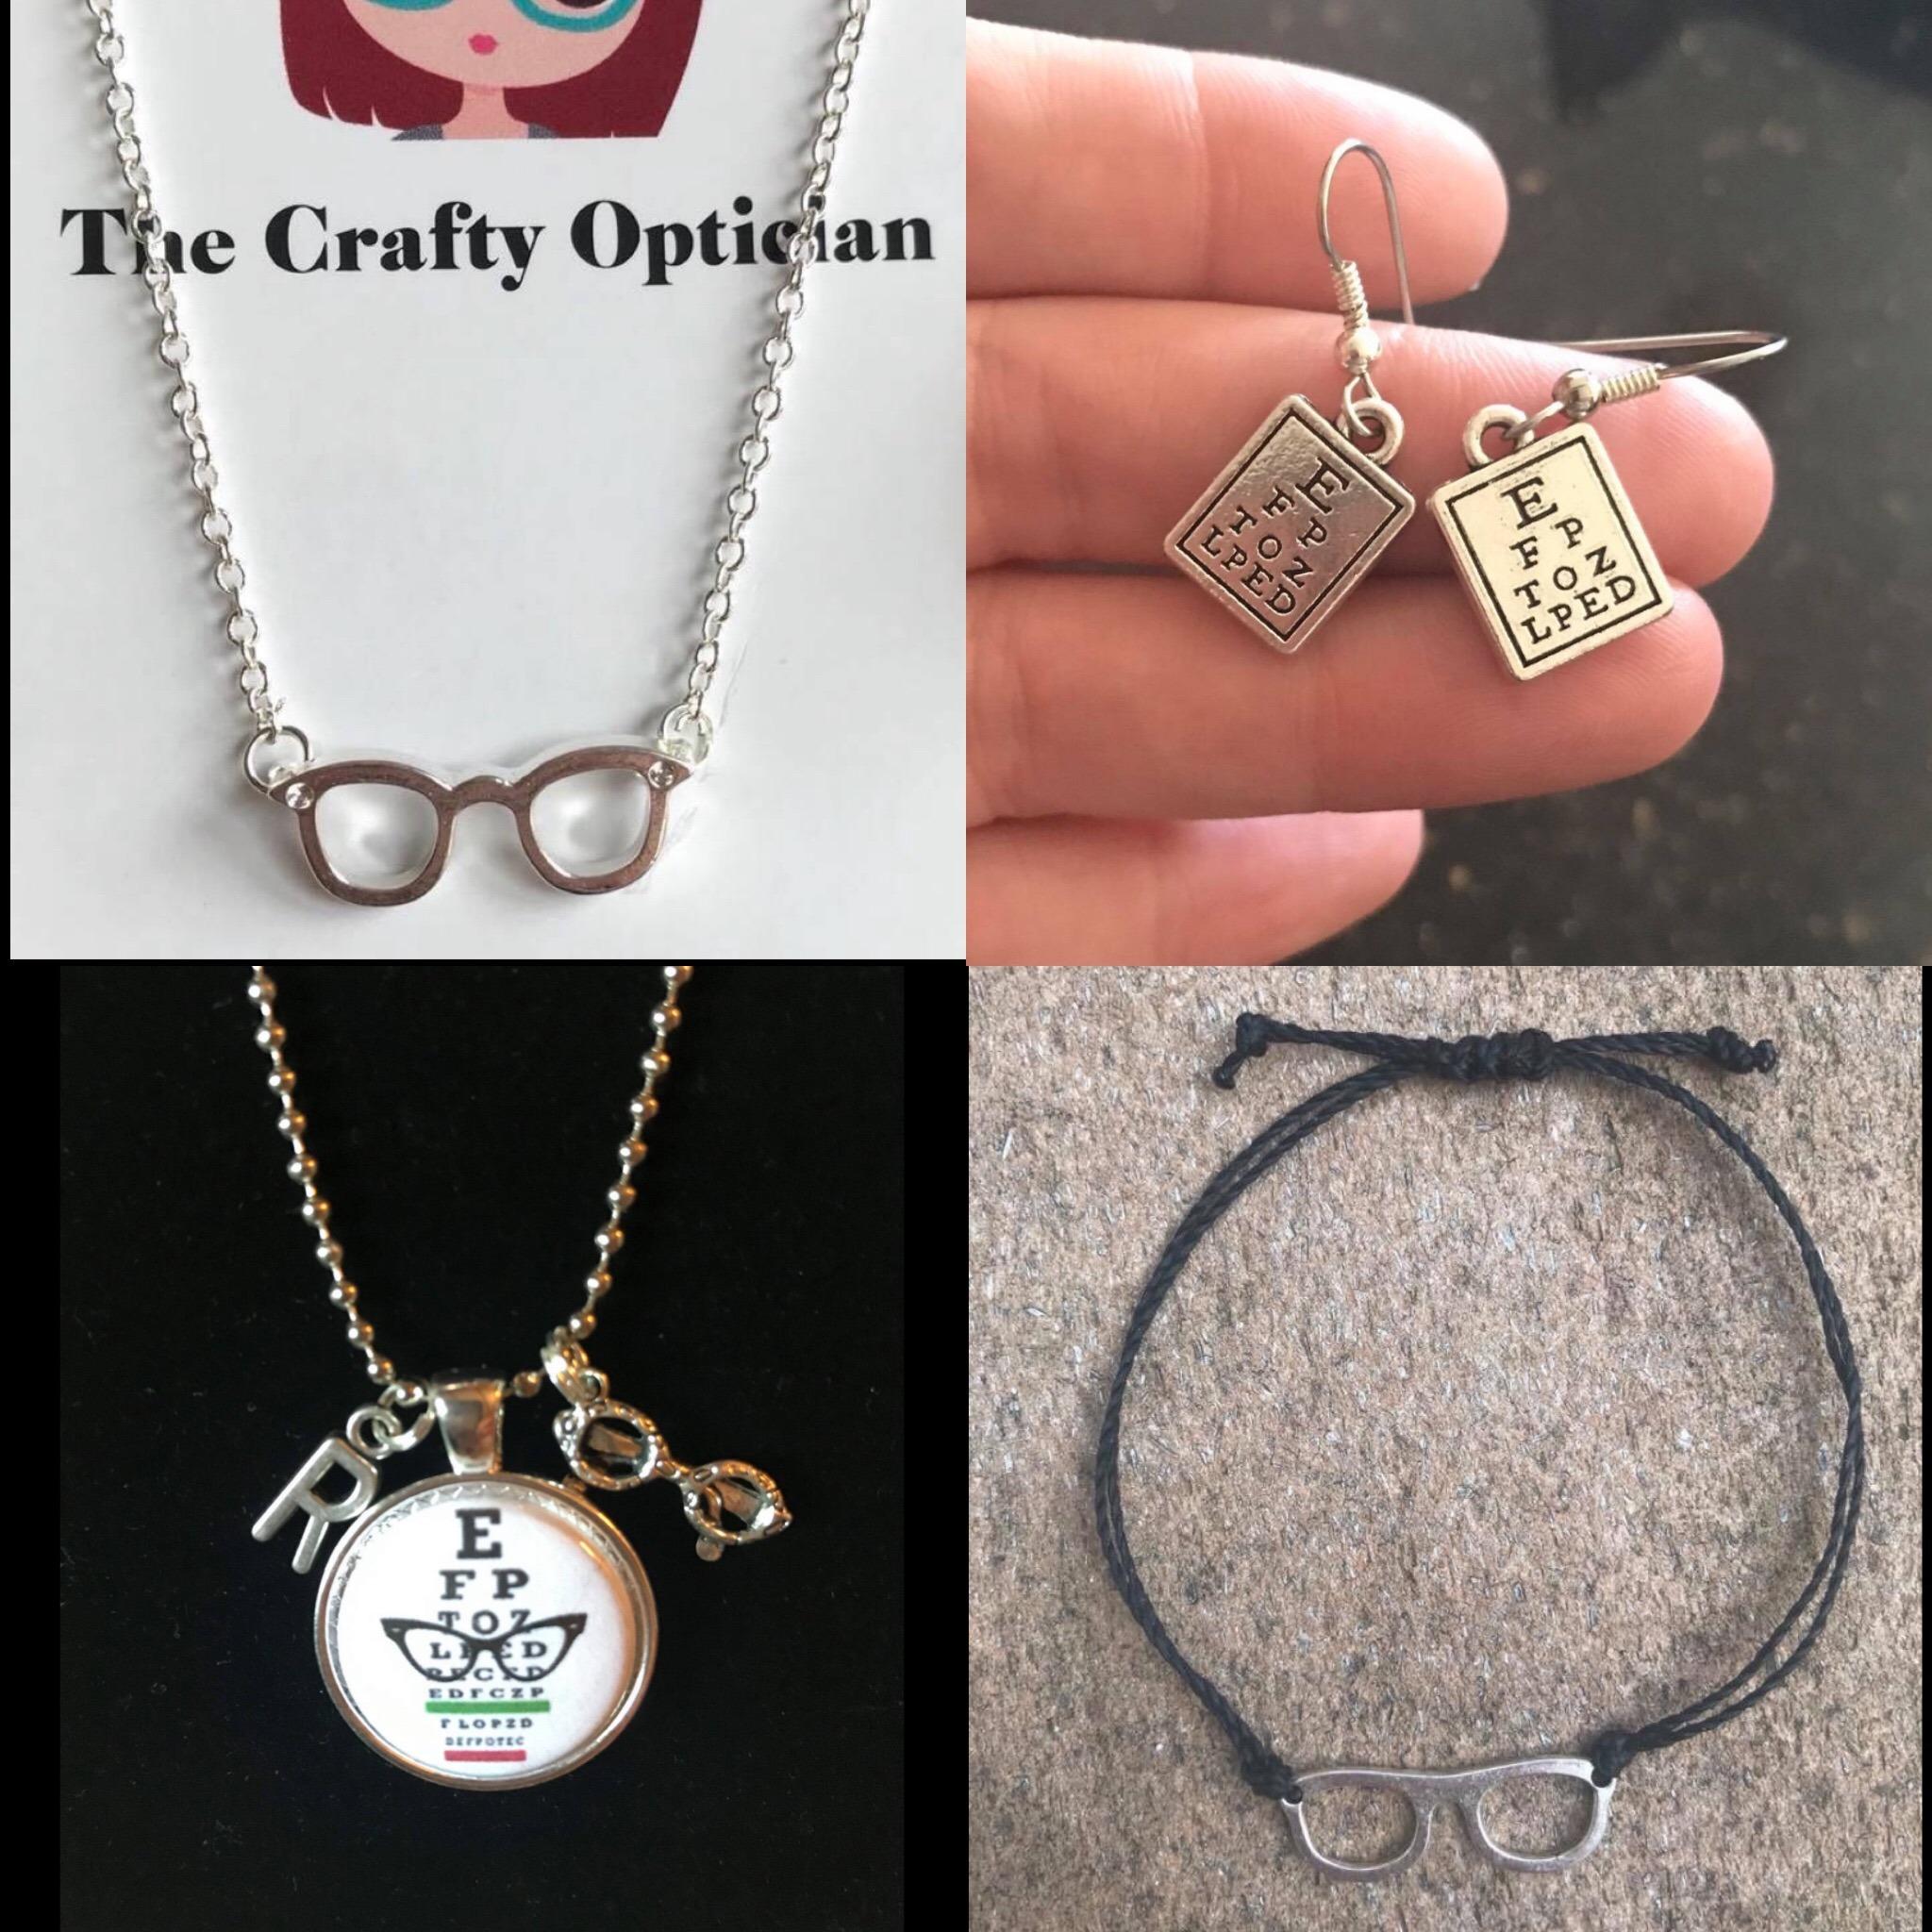 Crafty Optician